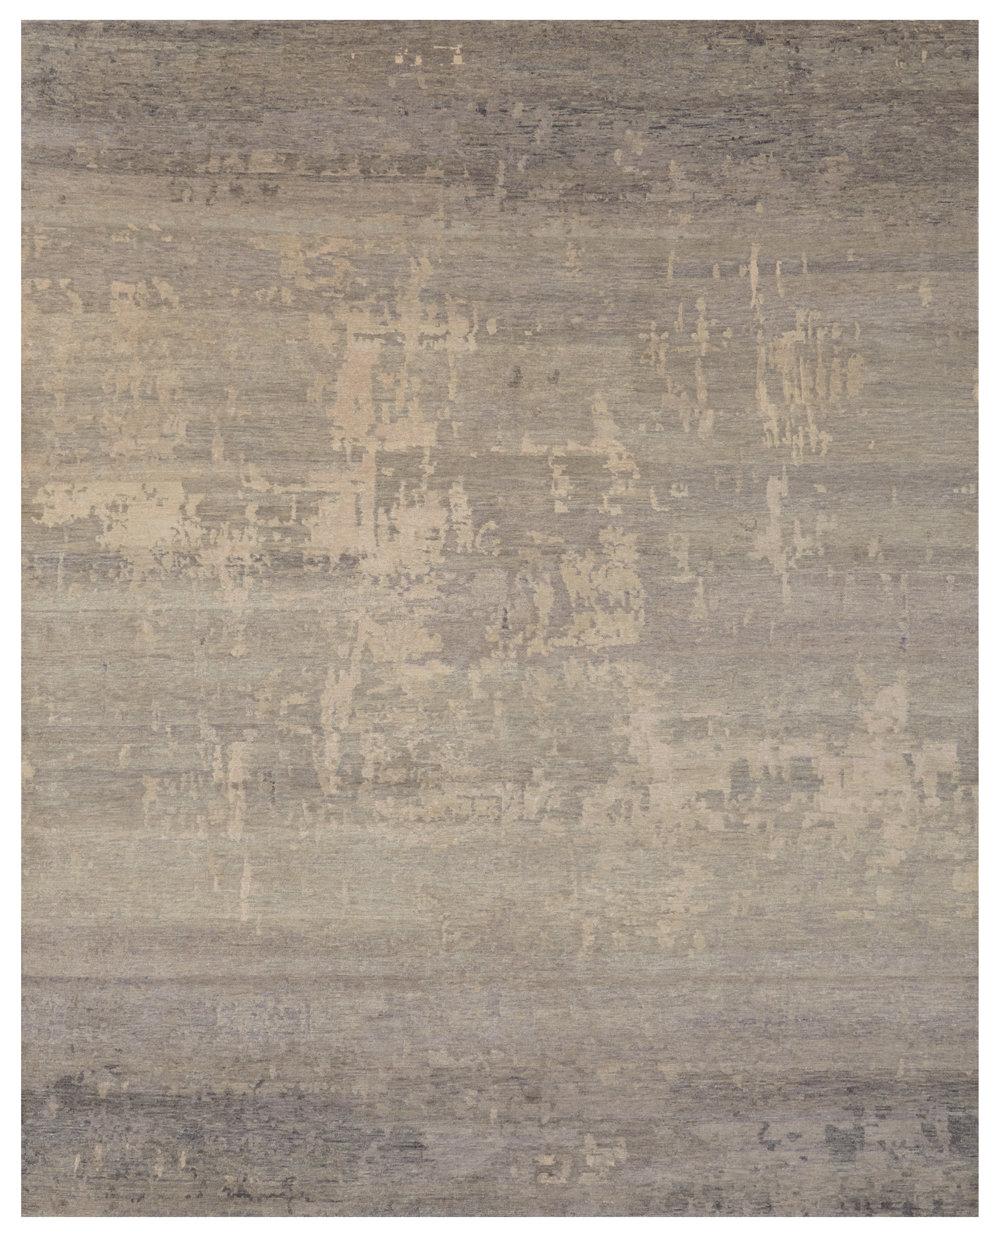 Mezzotint - Silver 8' x 10' .jpg